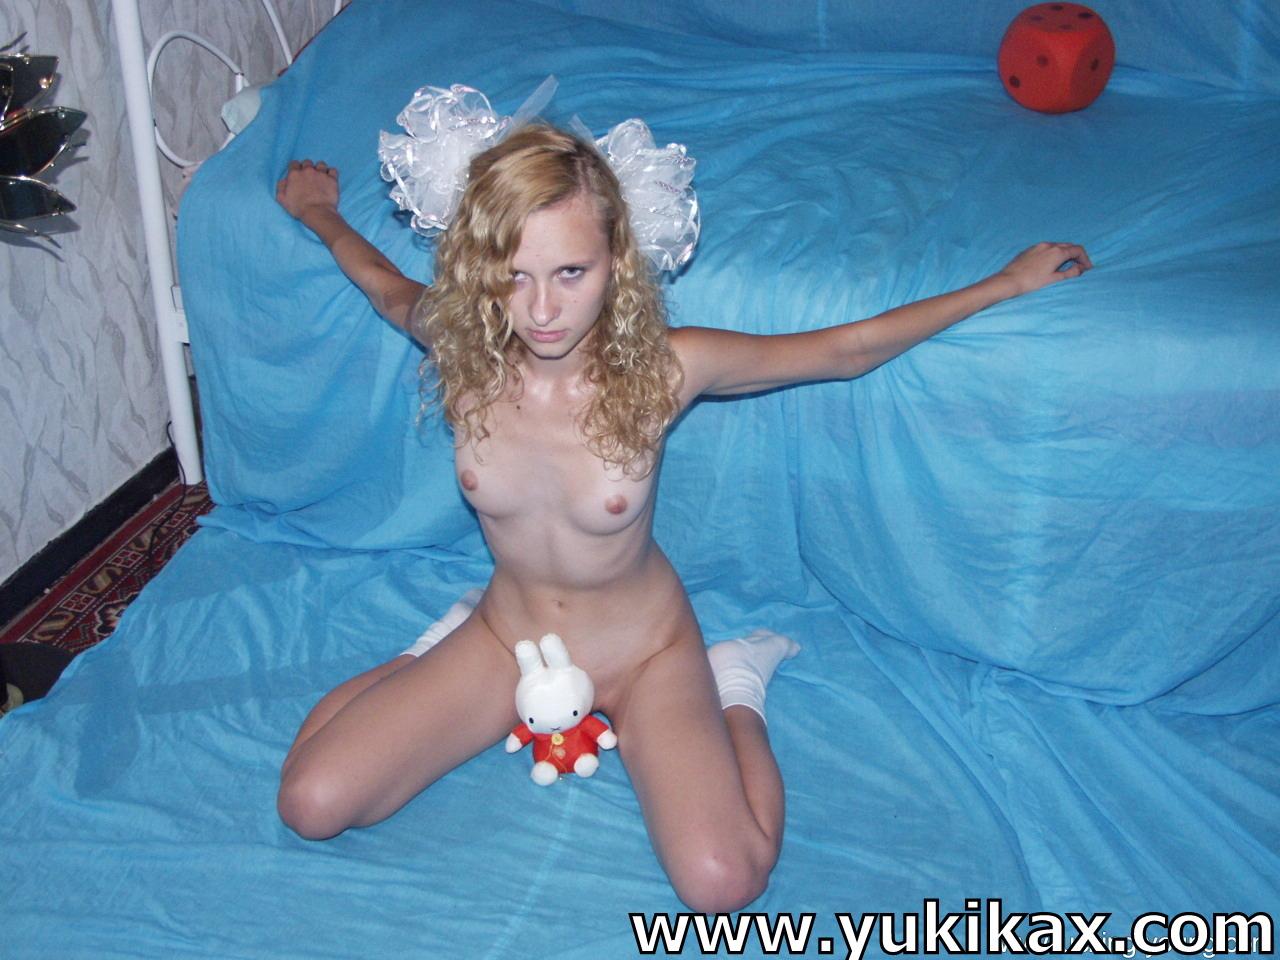 Yukikax Rika Nishimura Nude - Sex Porn Images